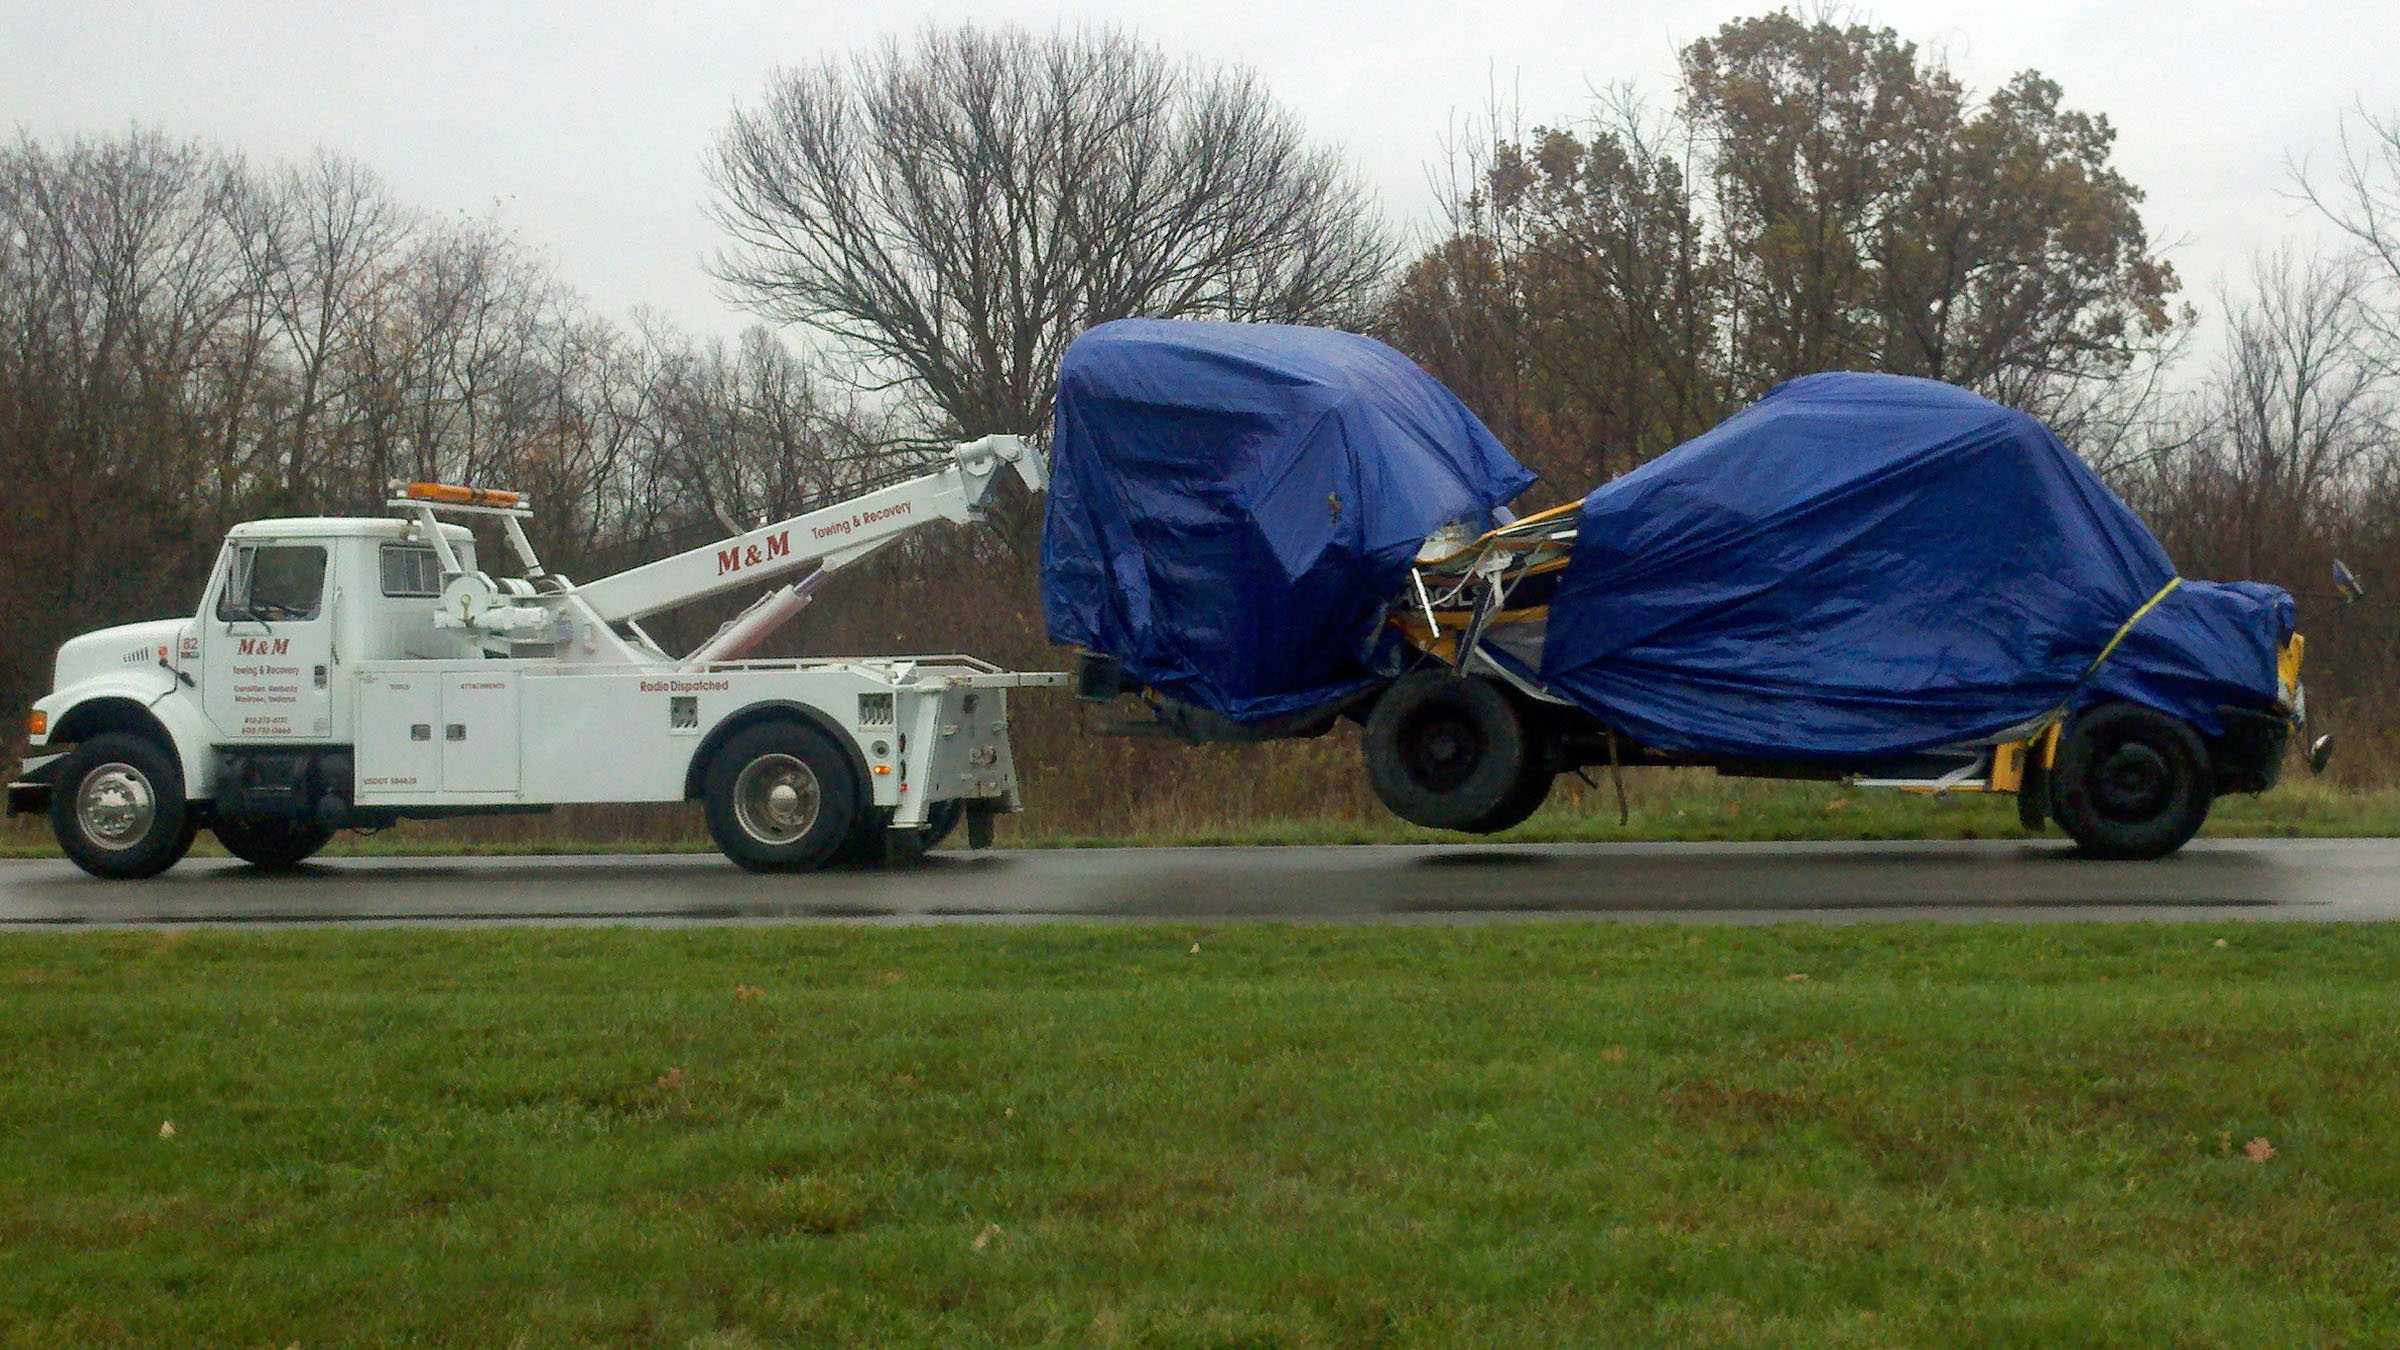 Carroll Co bus towed